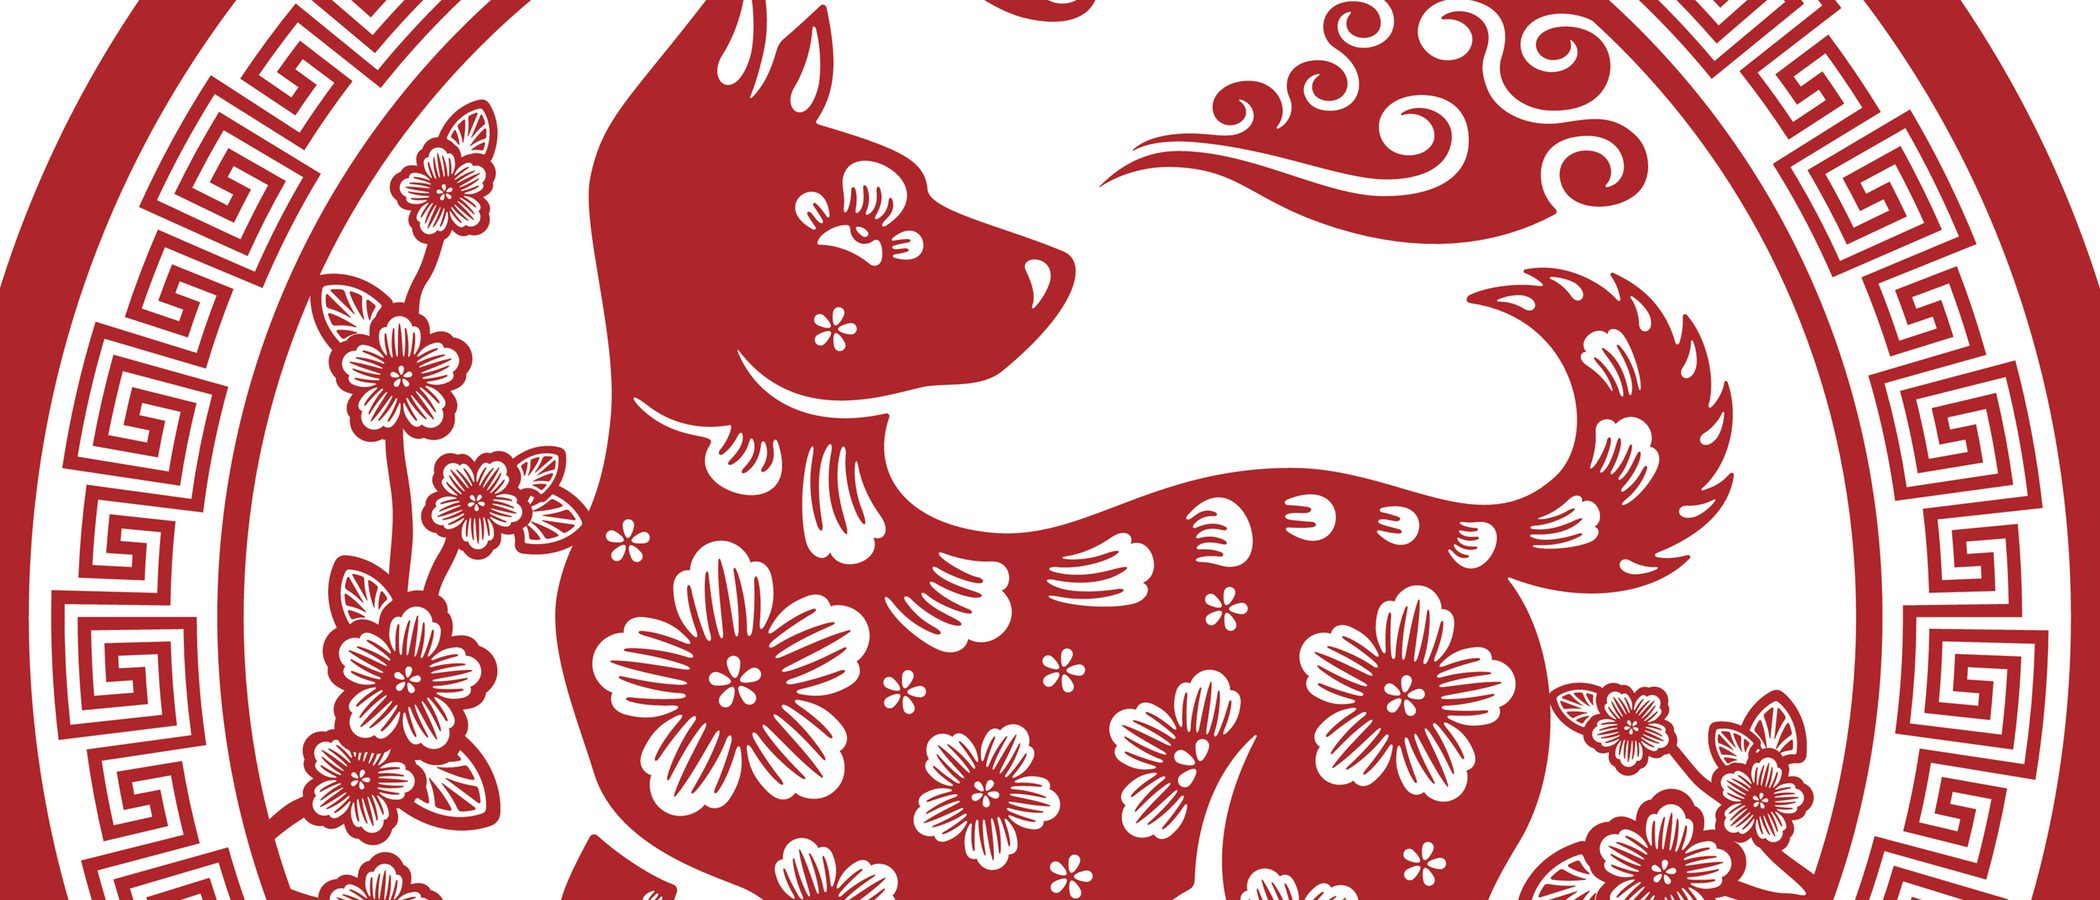 Horóscopo chino 2017: Perro